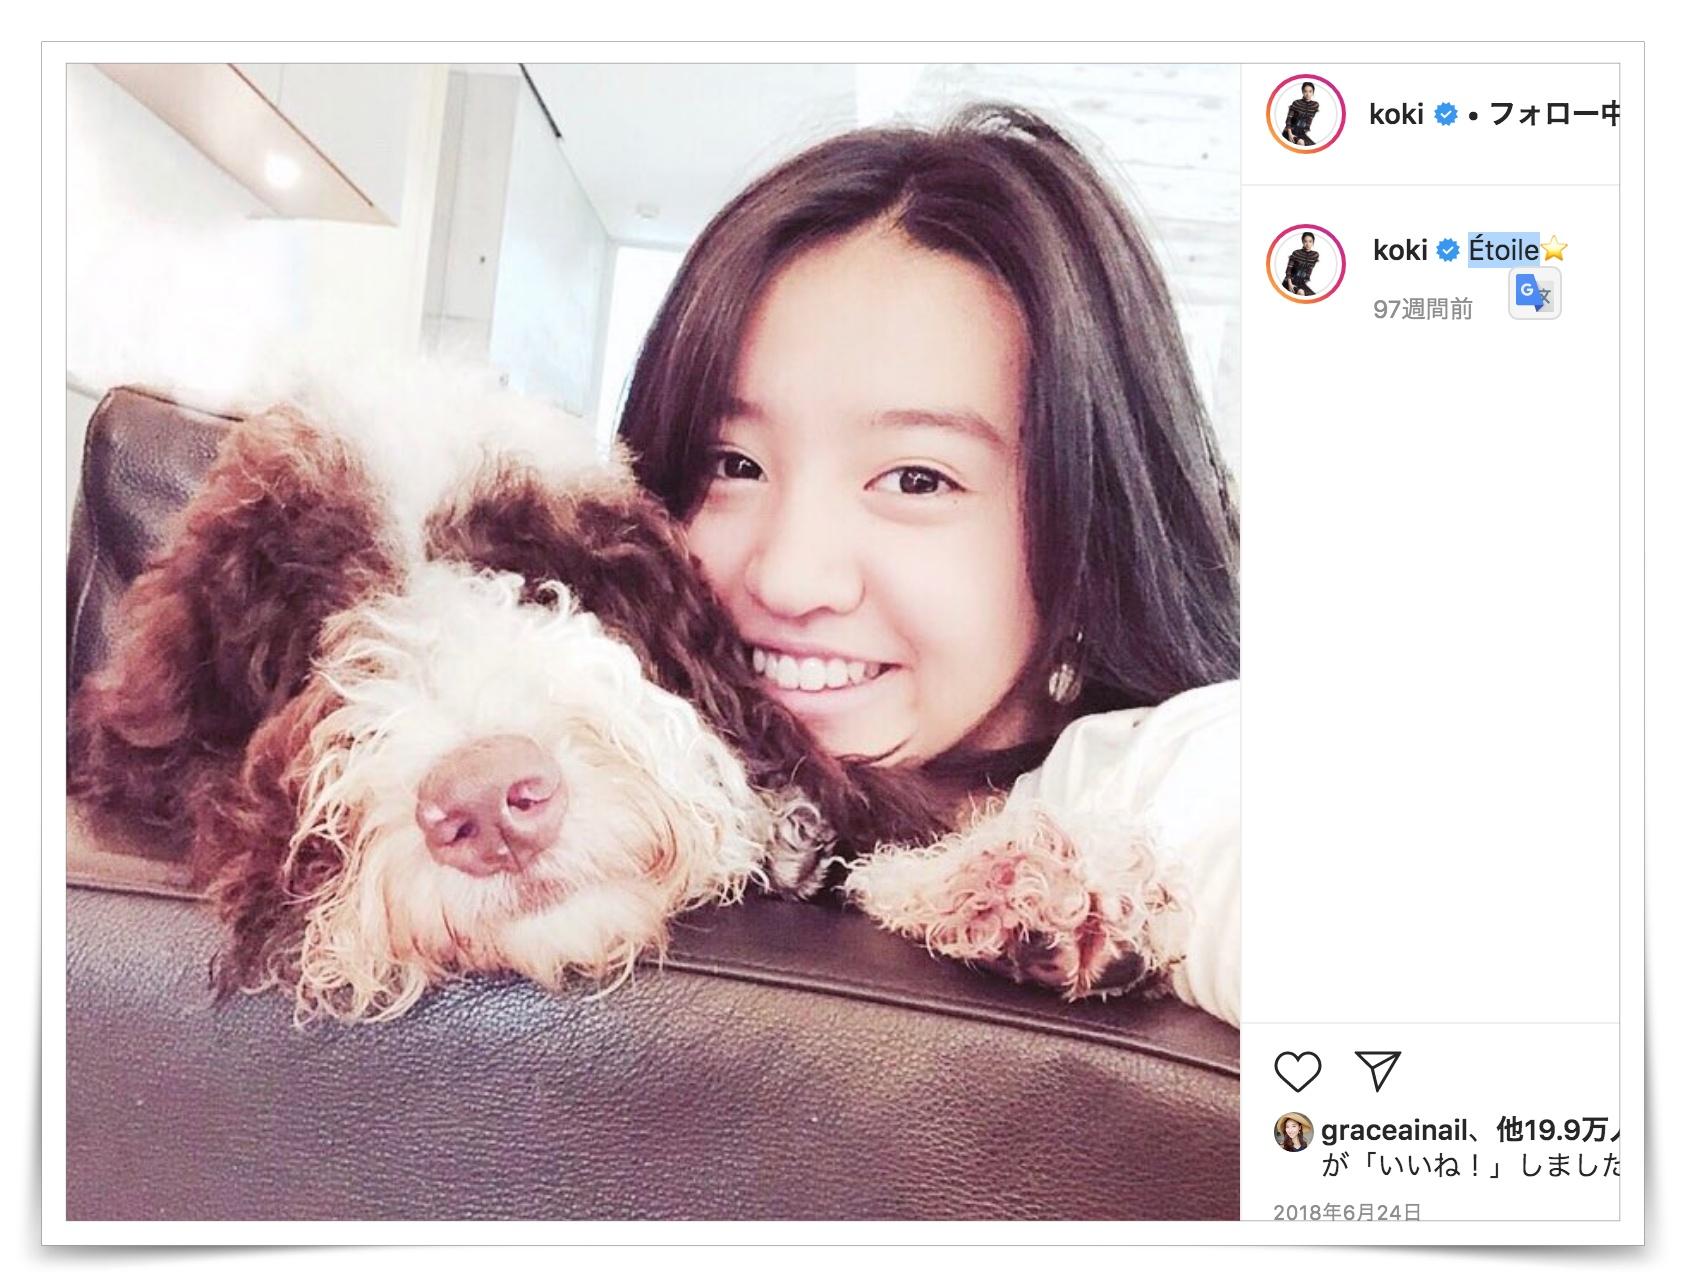 kokiと犬の画像